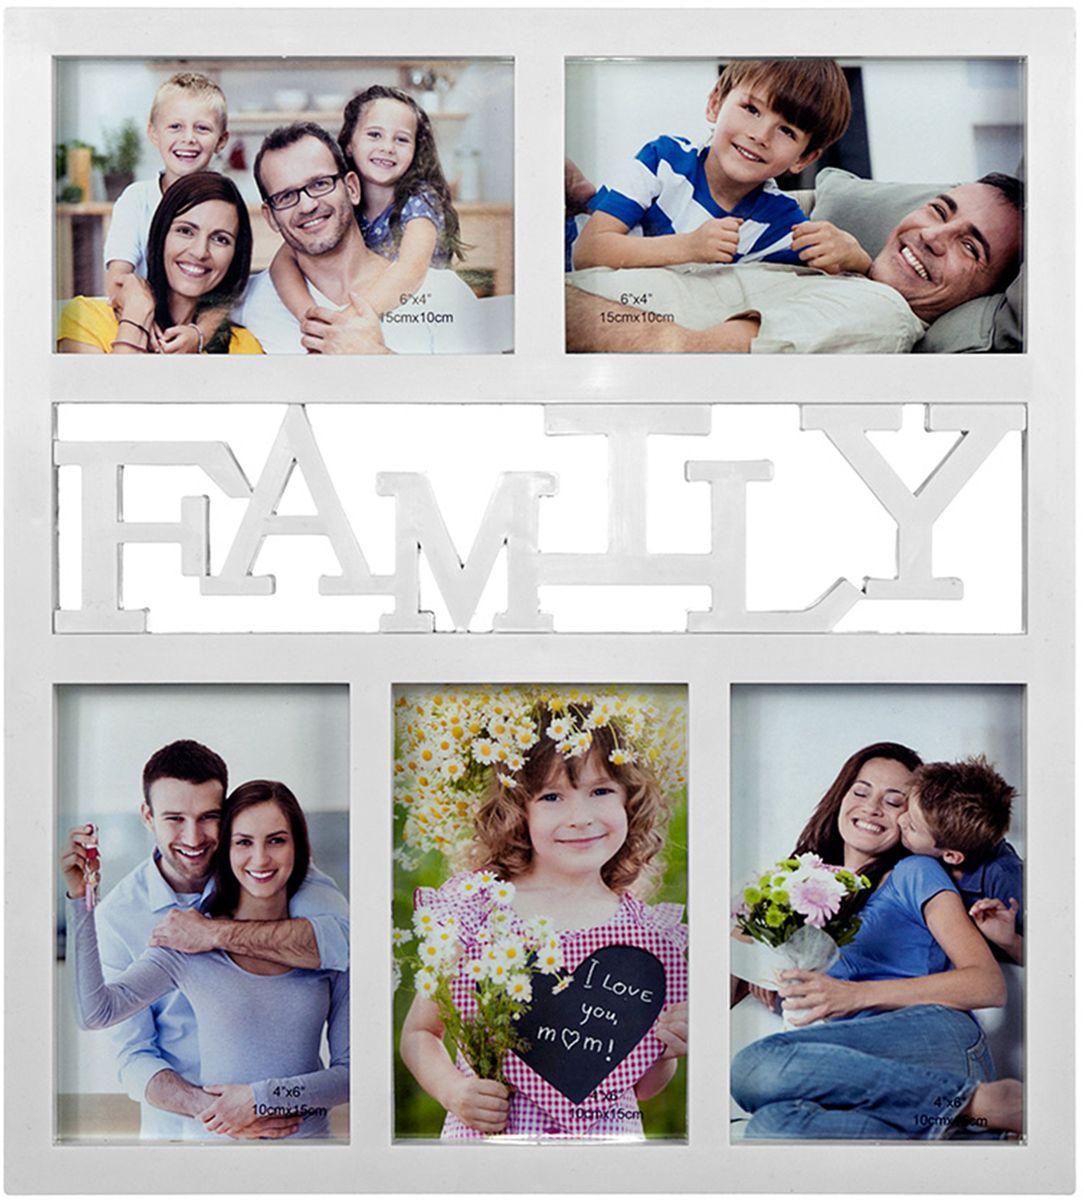 Фоторамка-коллаж Platinum Family, цвет: белый, 5 фоторамок. BIN-1123131-WBIN-1123131-WПластиковый коллаж с 5 фото 10 х 15 см.